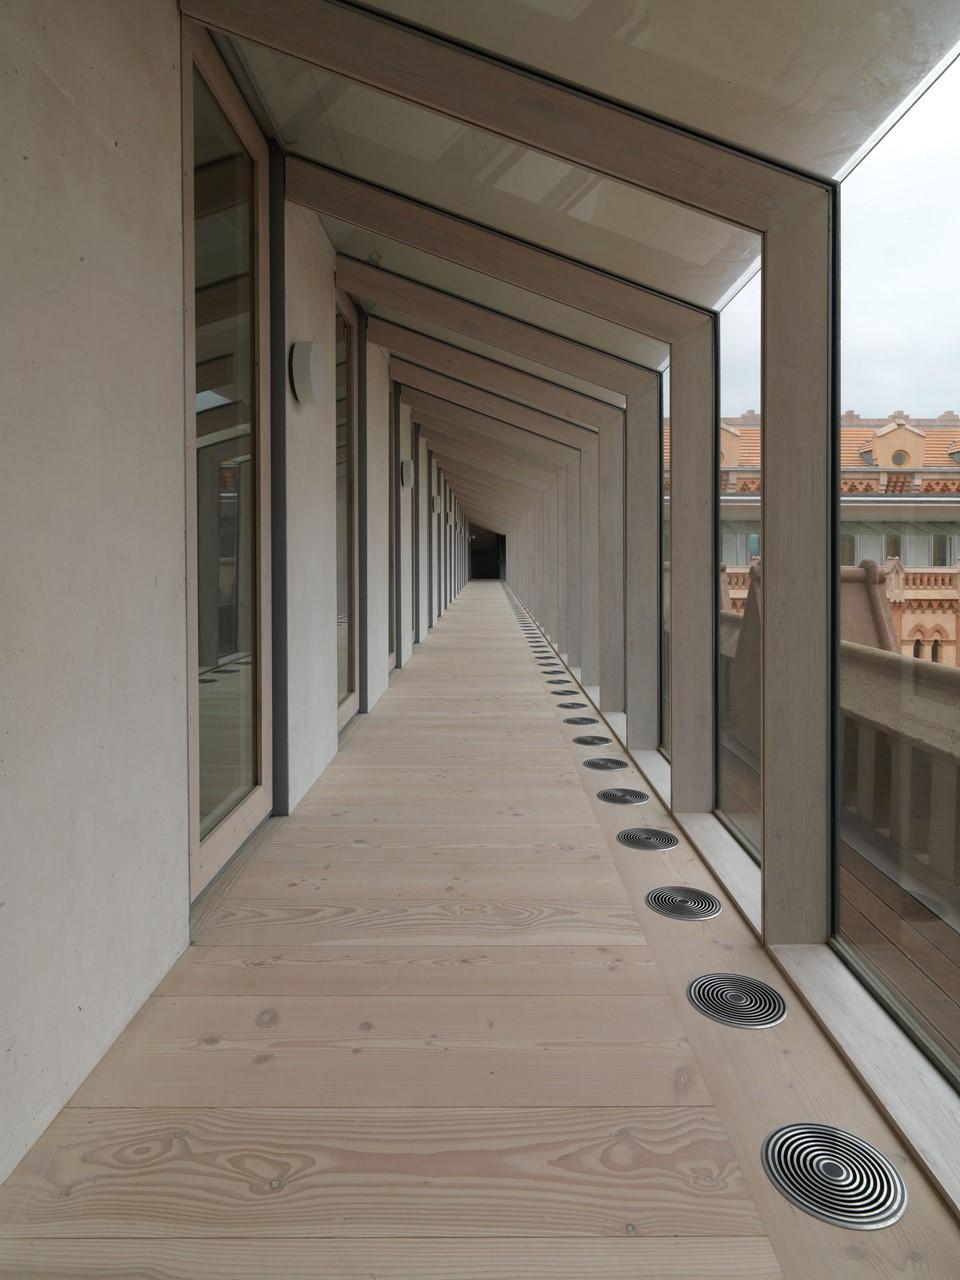 douglas-solid-floor-restoration_lye-white-soap_comillas-university-spain_dinesen.jpg